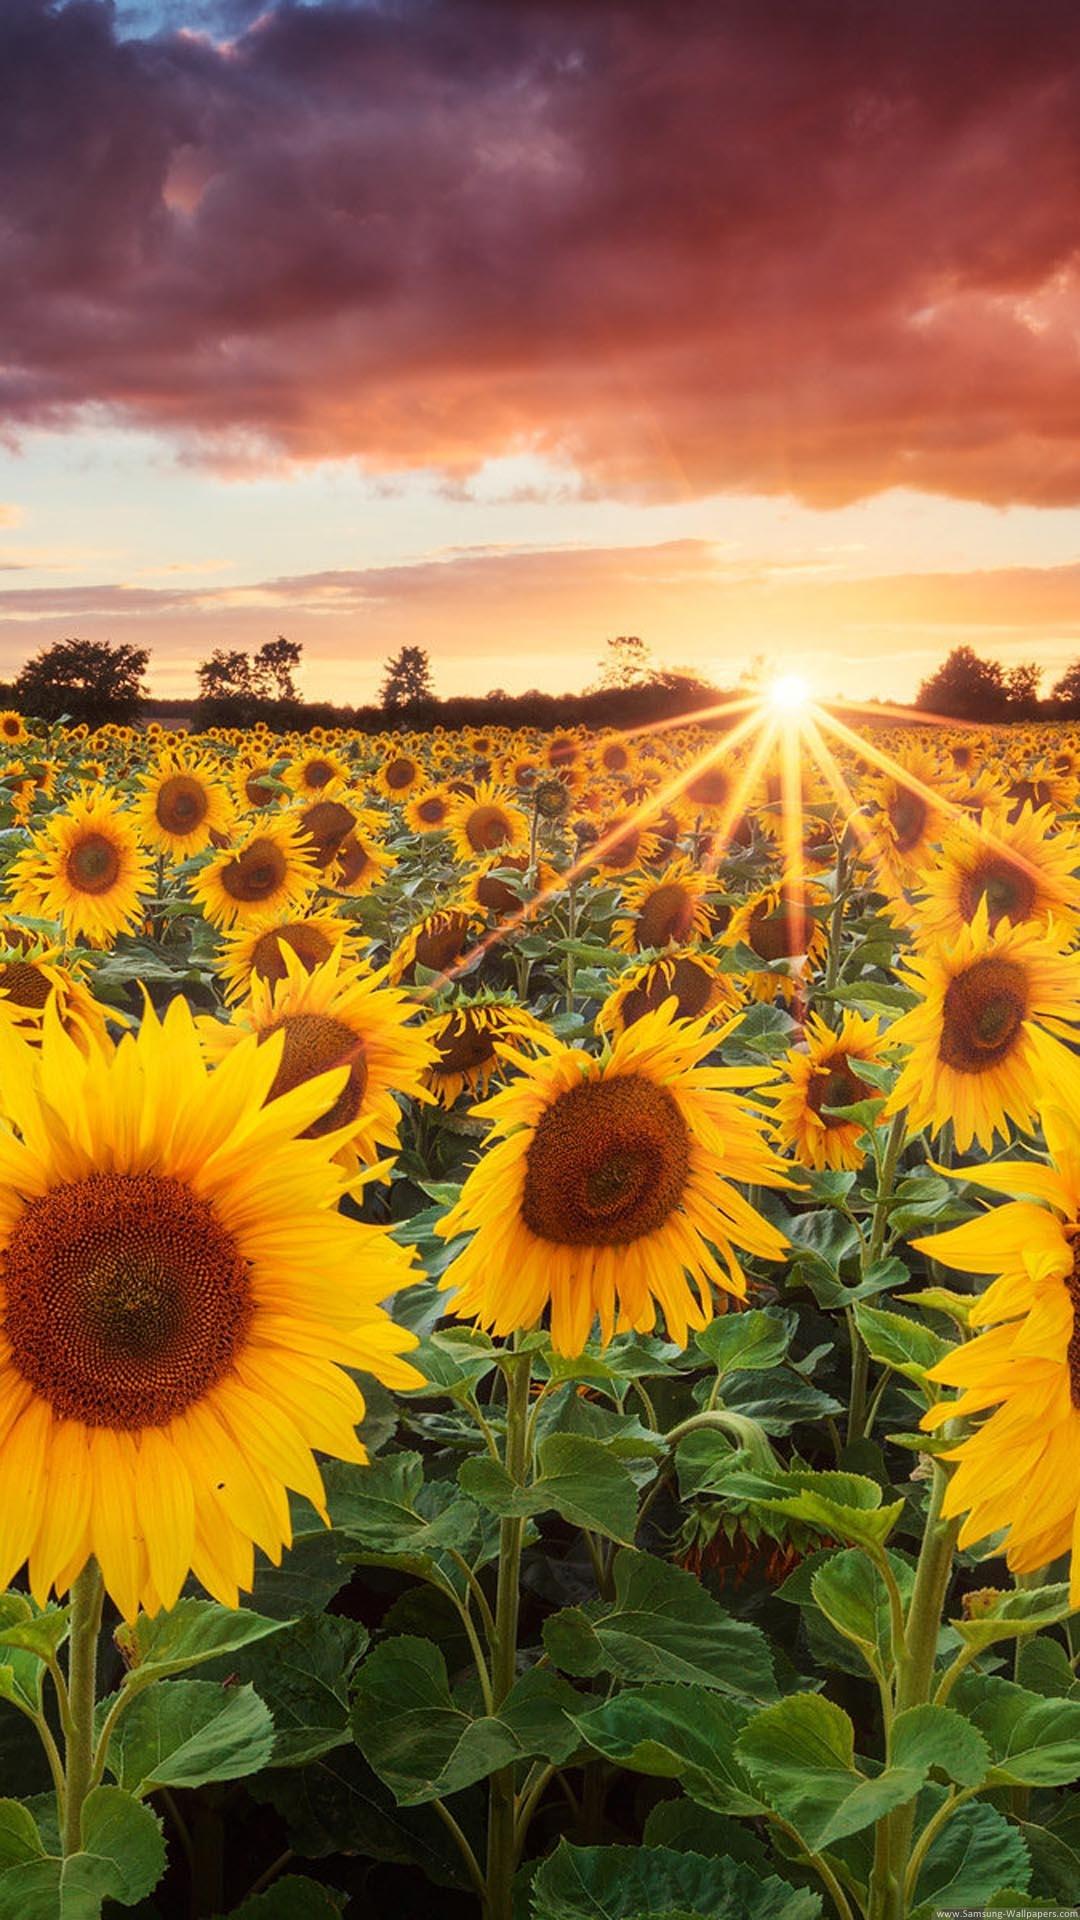 Sunflower Field Sunset iPhone 6 Plus HD Wallpaper iPhone 66S7 1080x1920